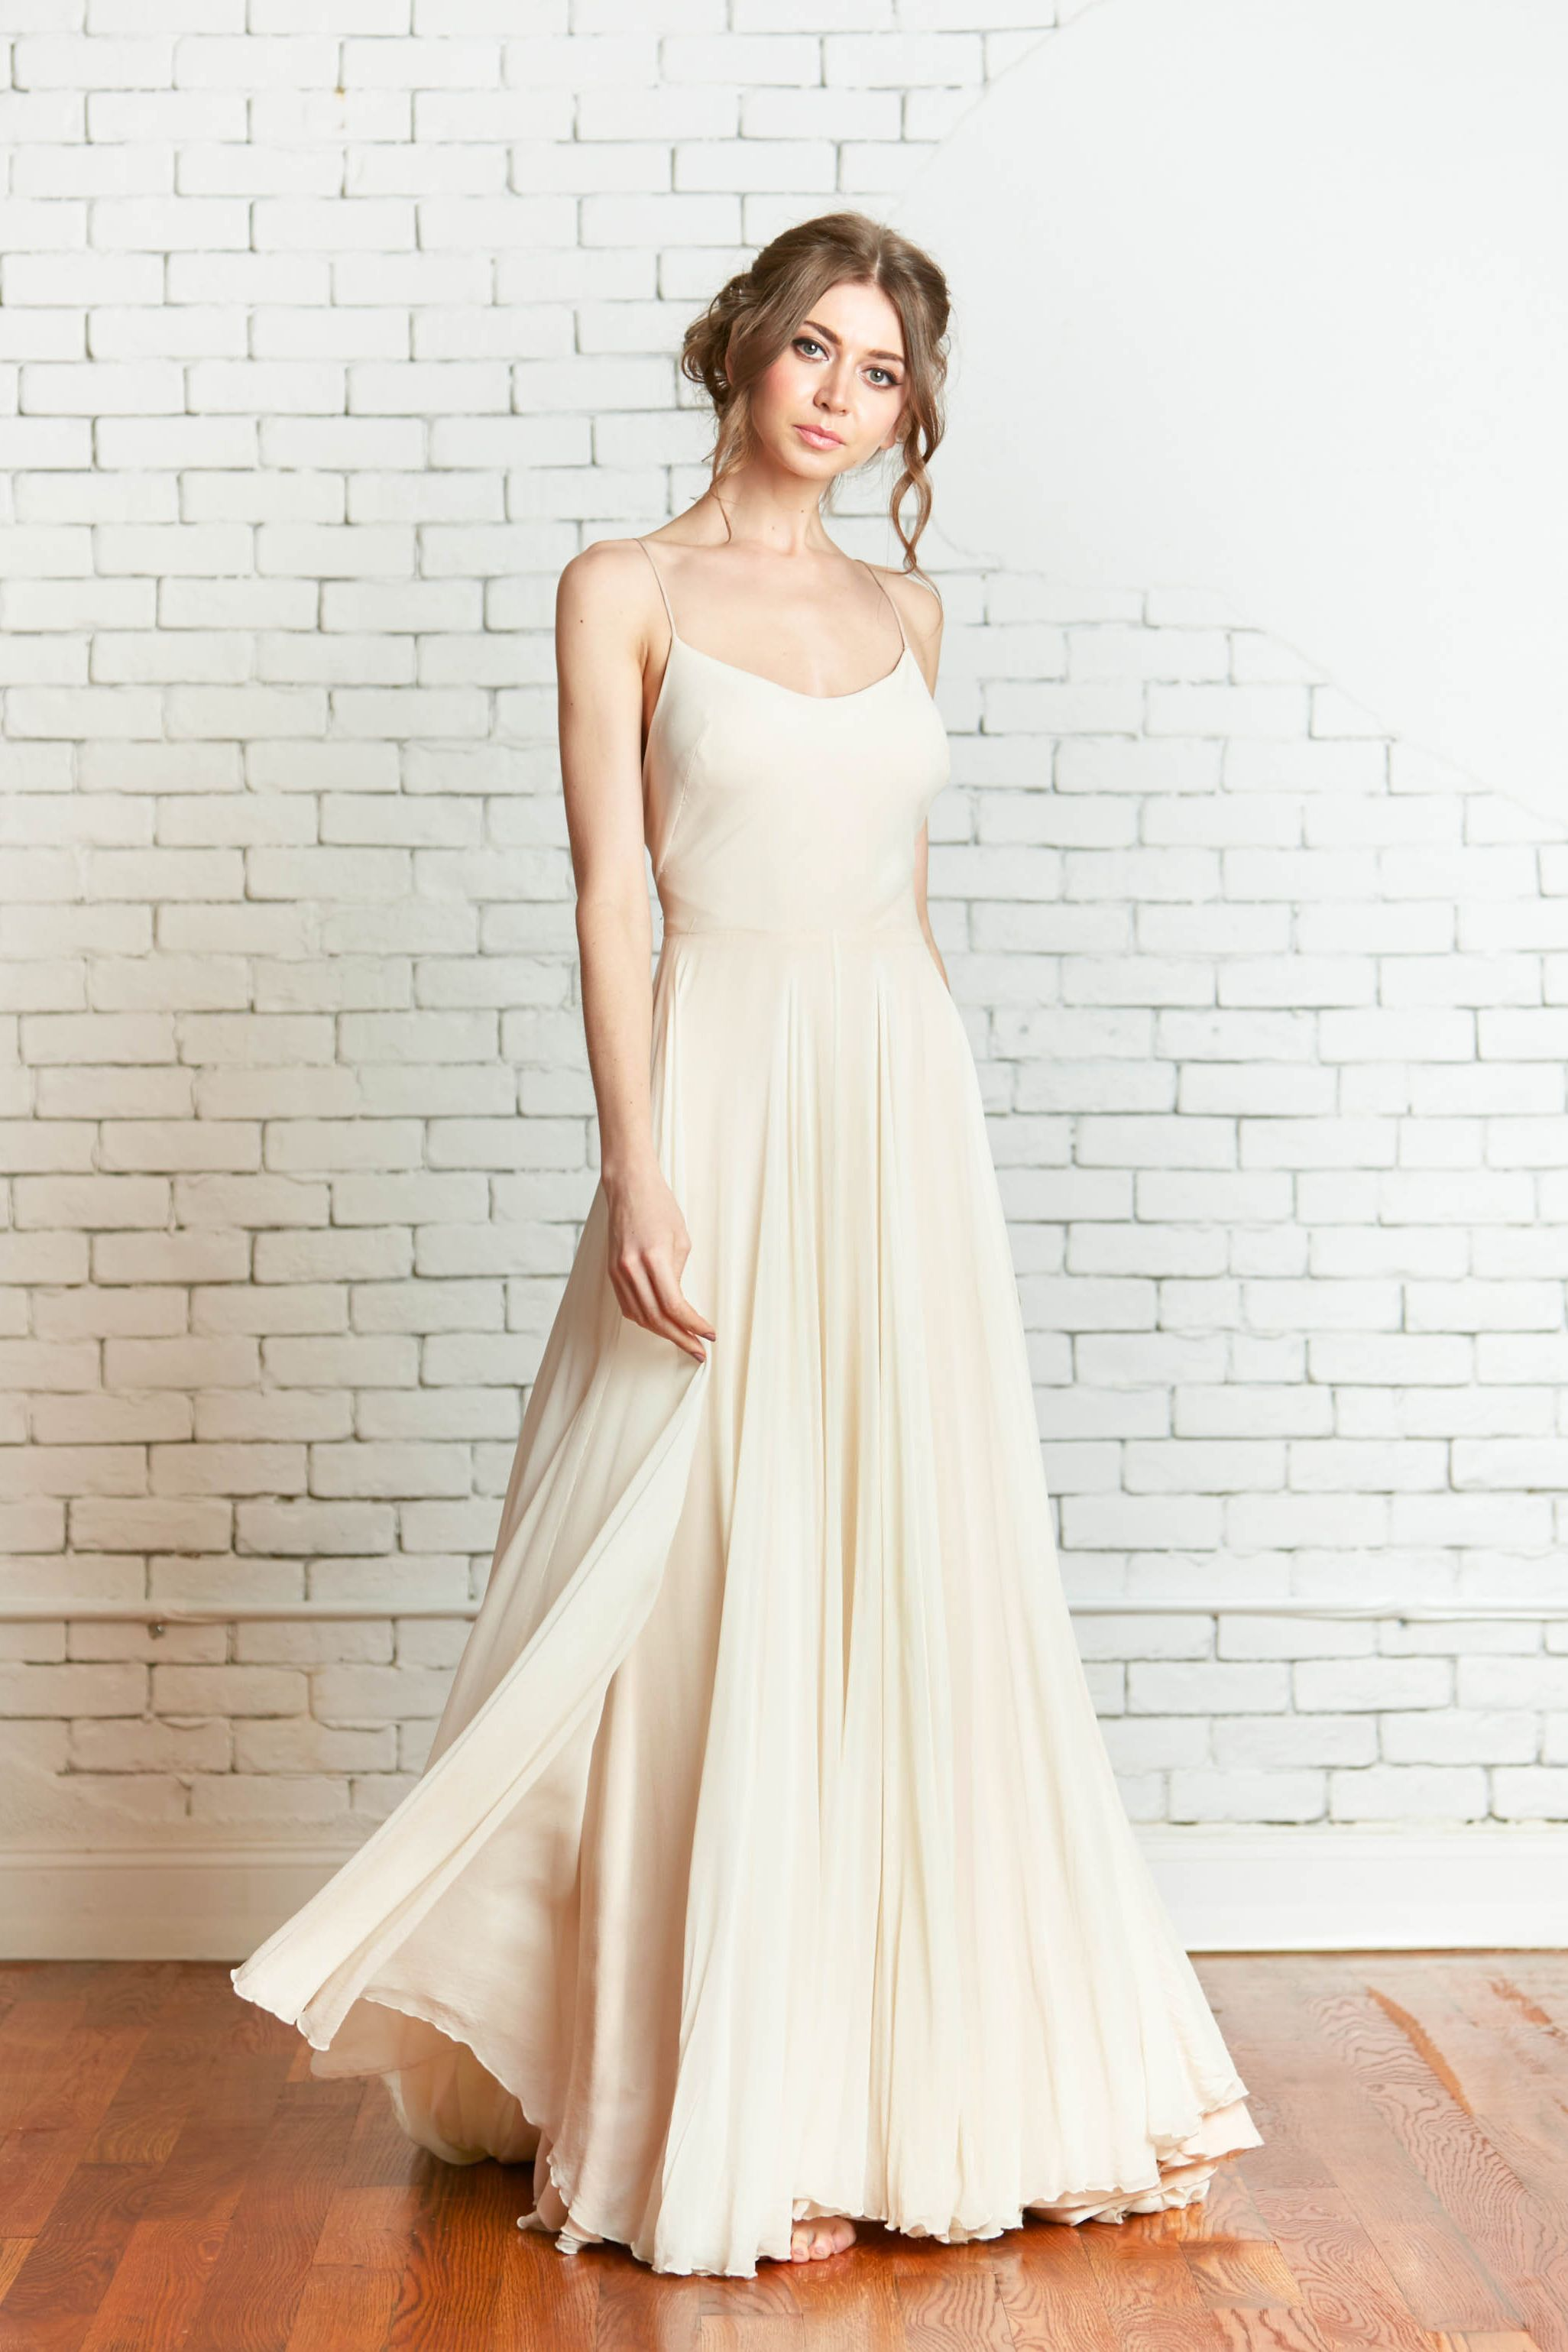 Wedding dresses brooklyn  Rebecca Schoneveld Bridal Gown The VivianSage Gown handmade in